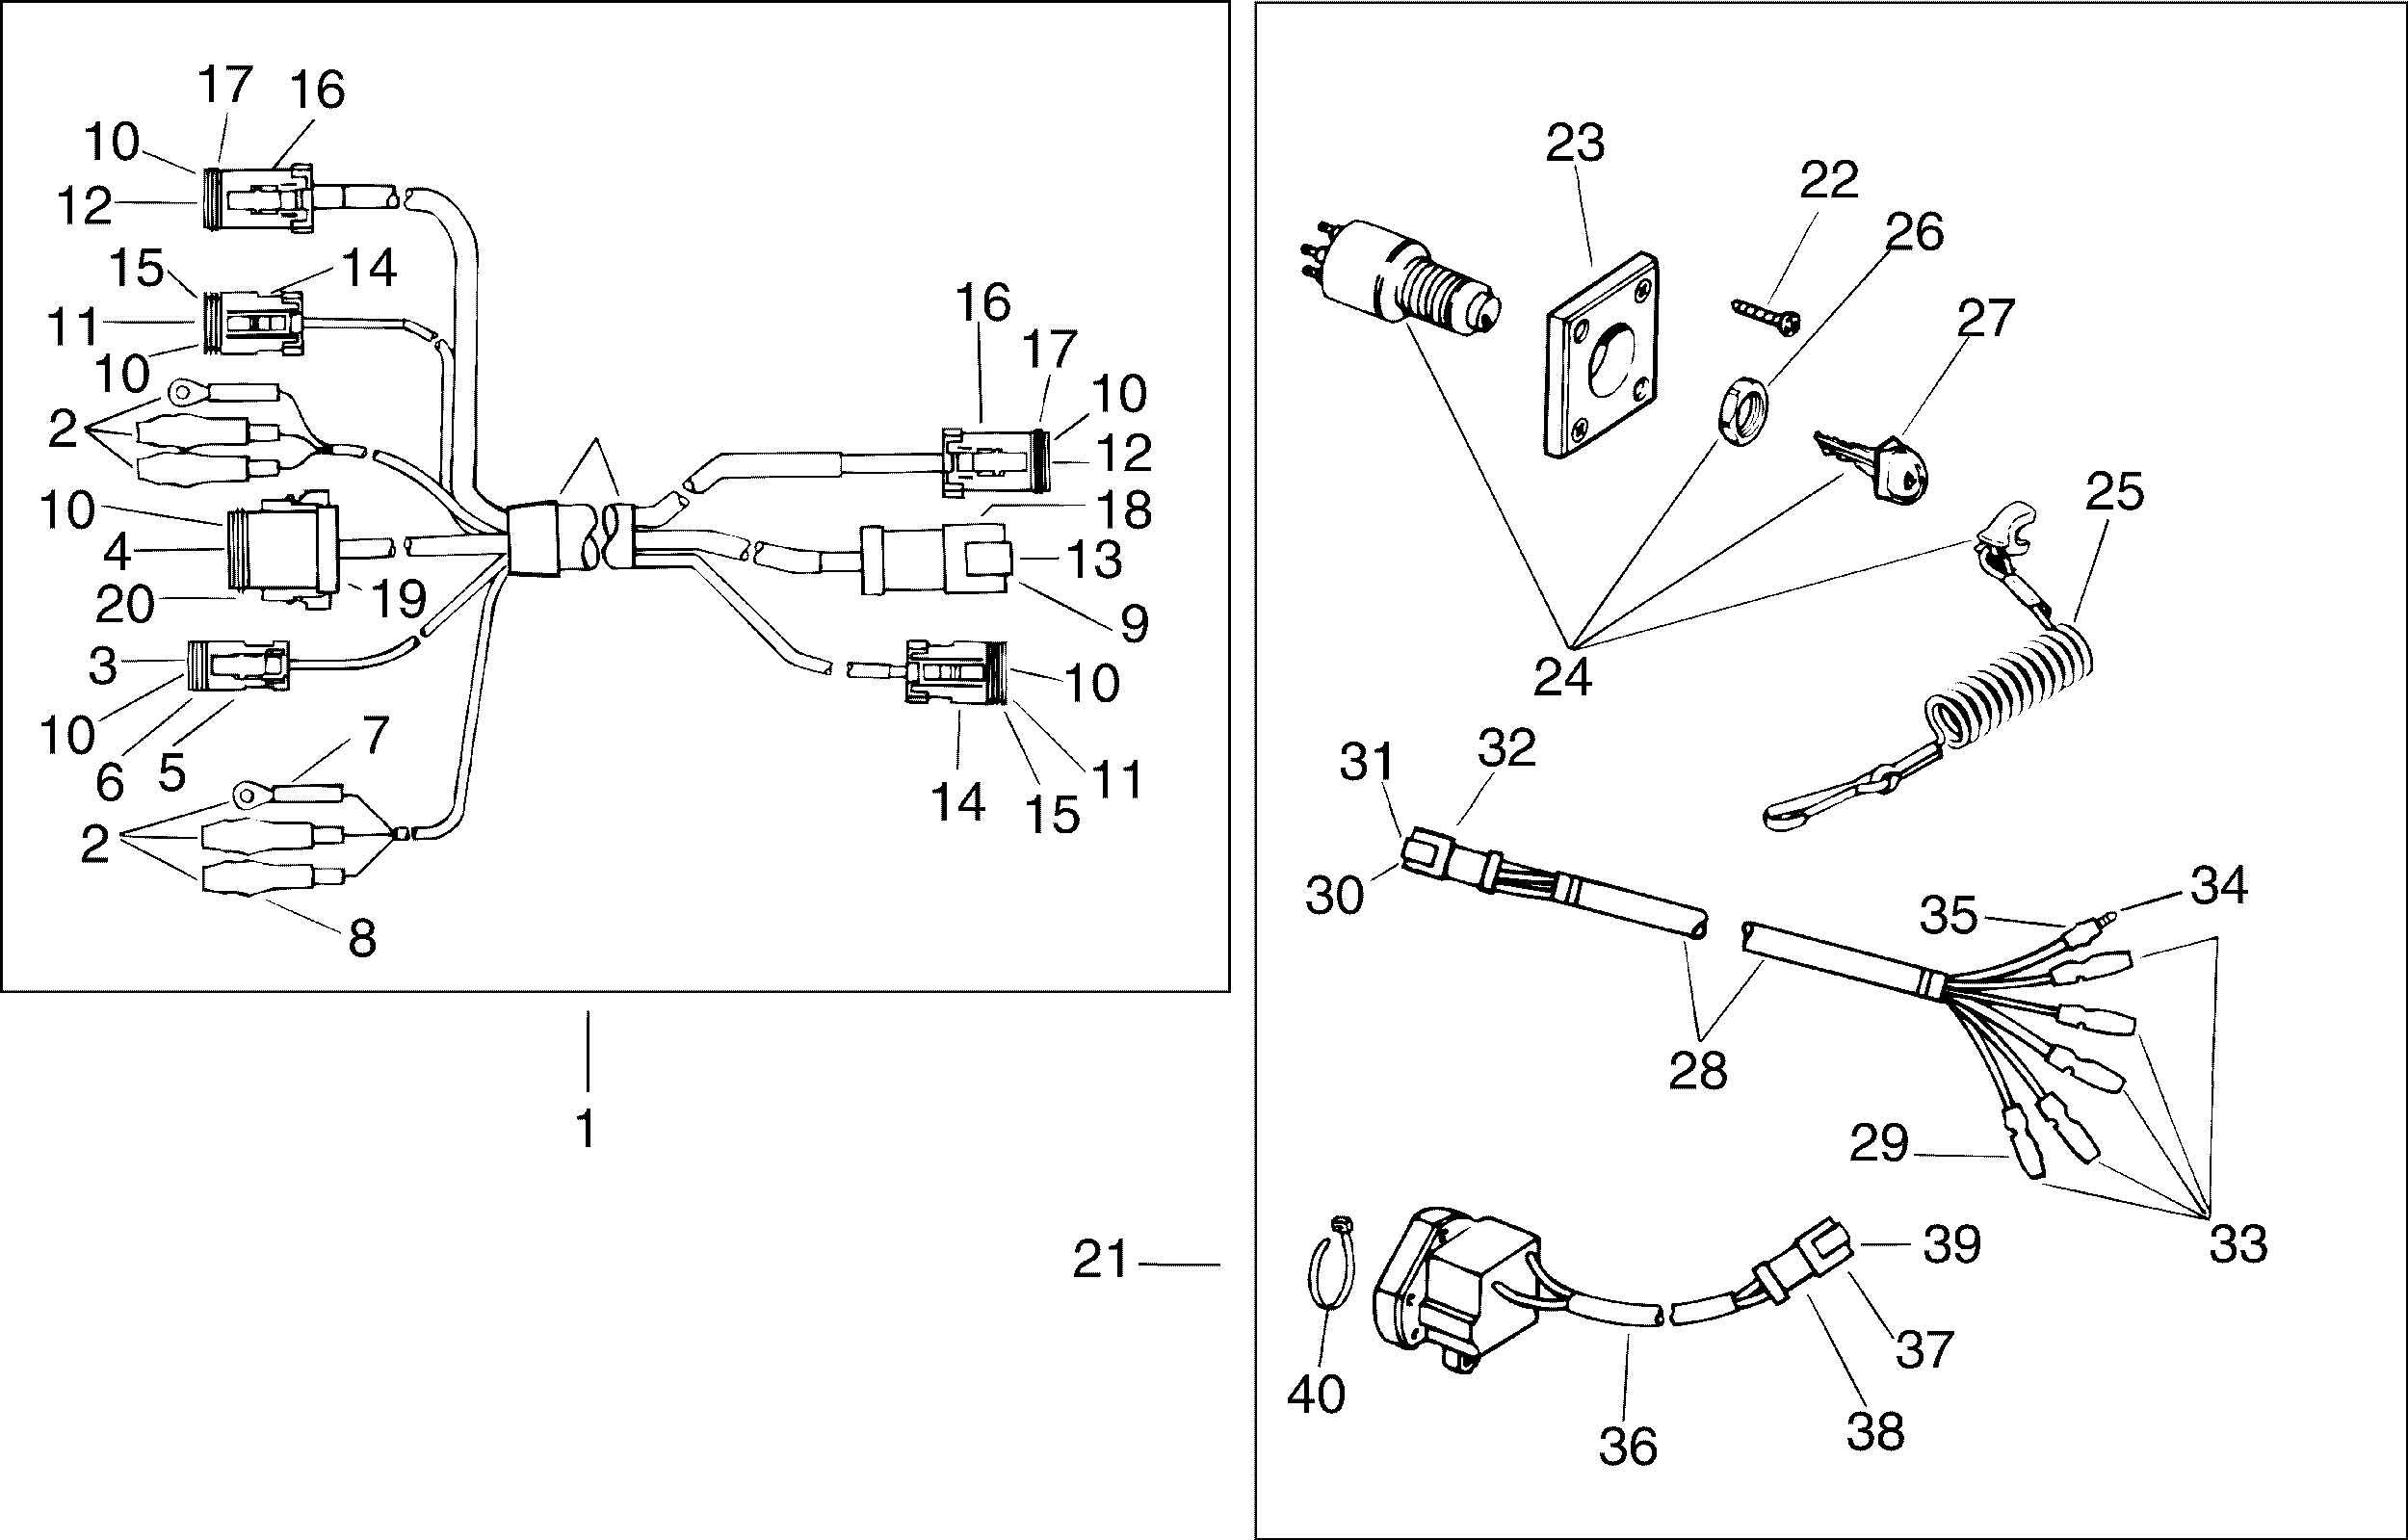 50 Hp Johnson Wiring Diagram